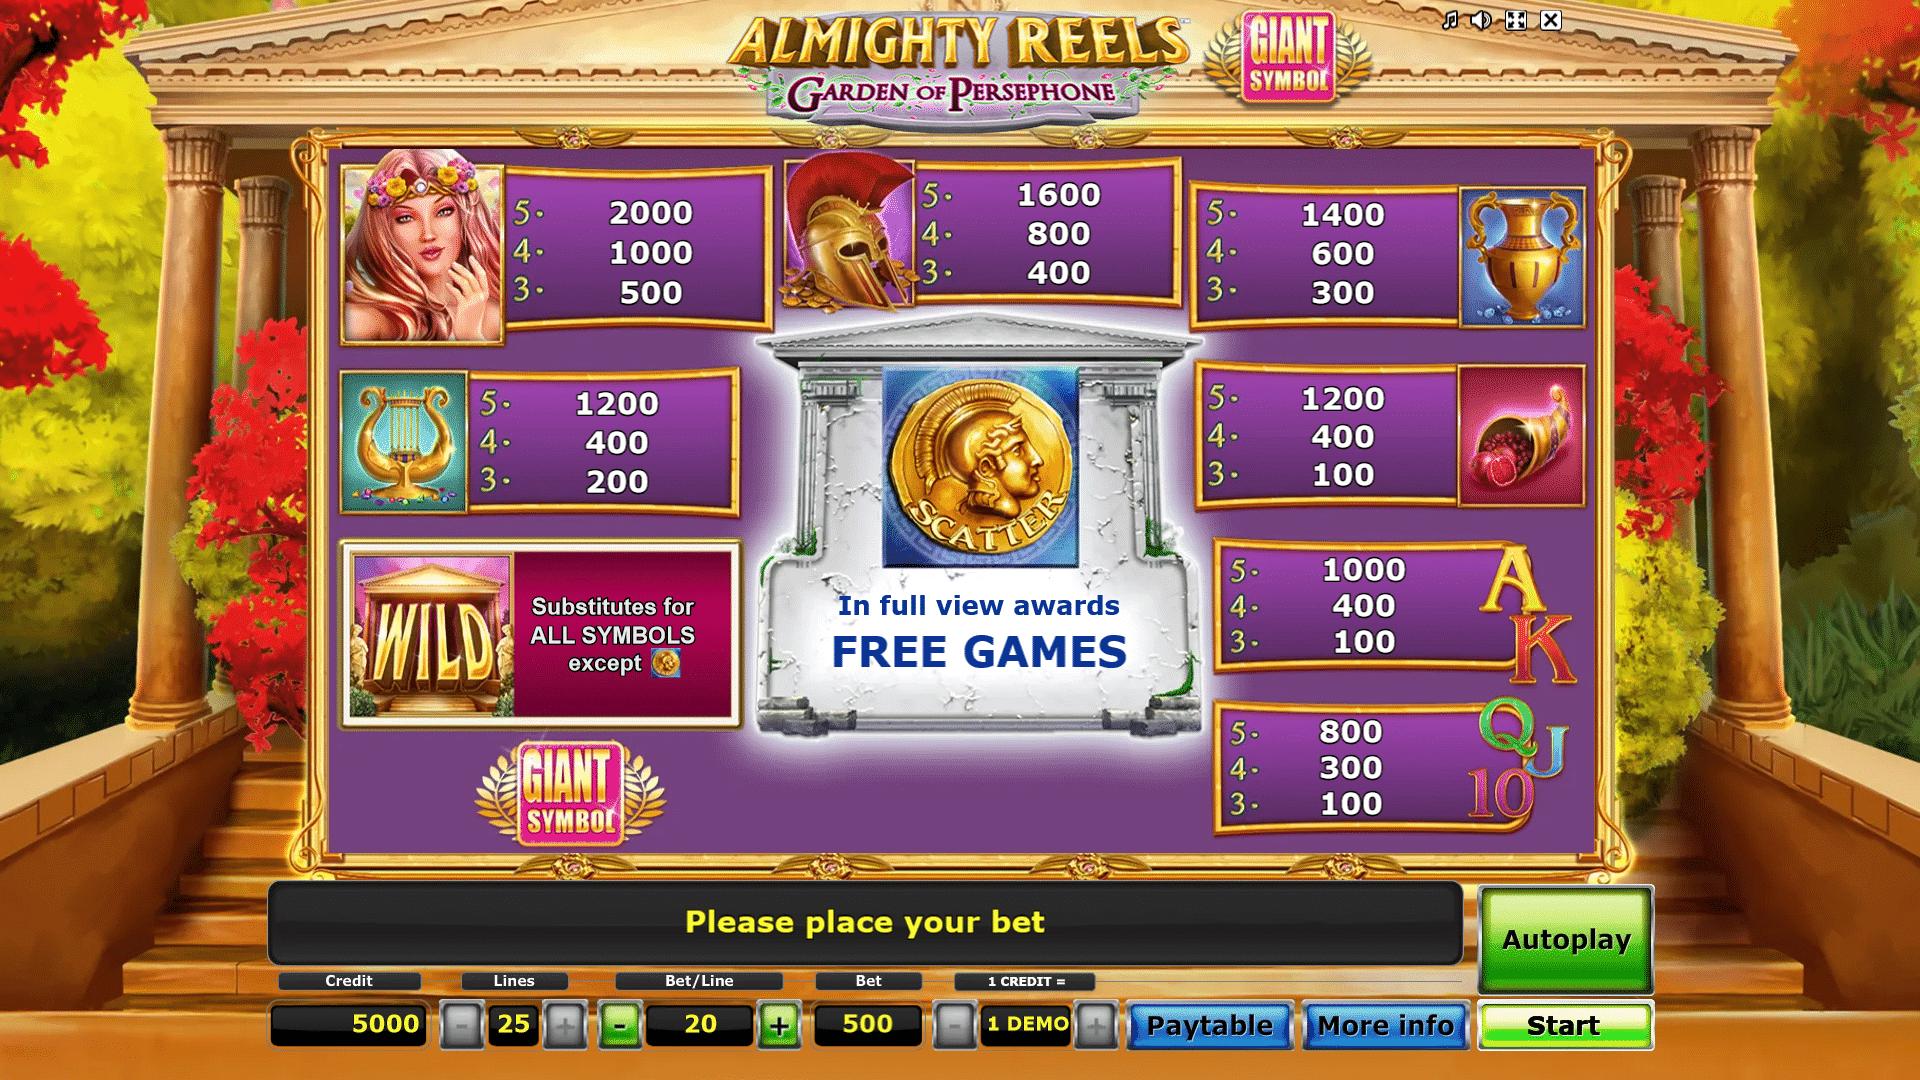 Paytable Slot gratis Almighty Reels Garden of Persephone